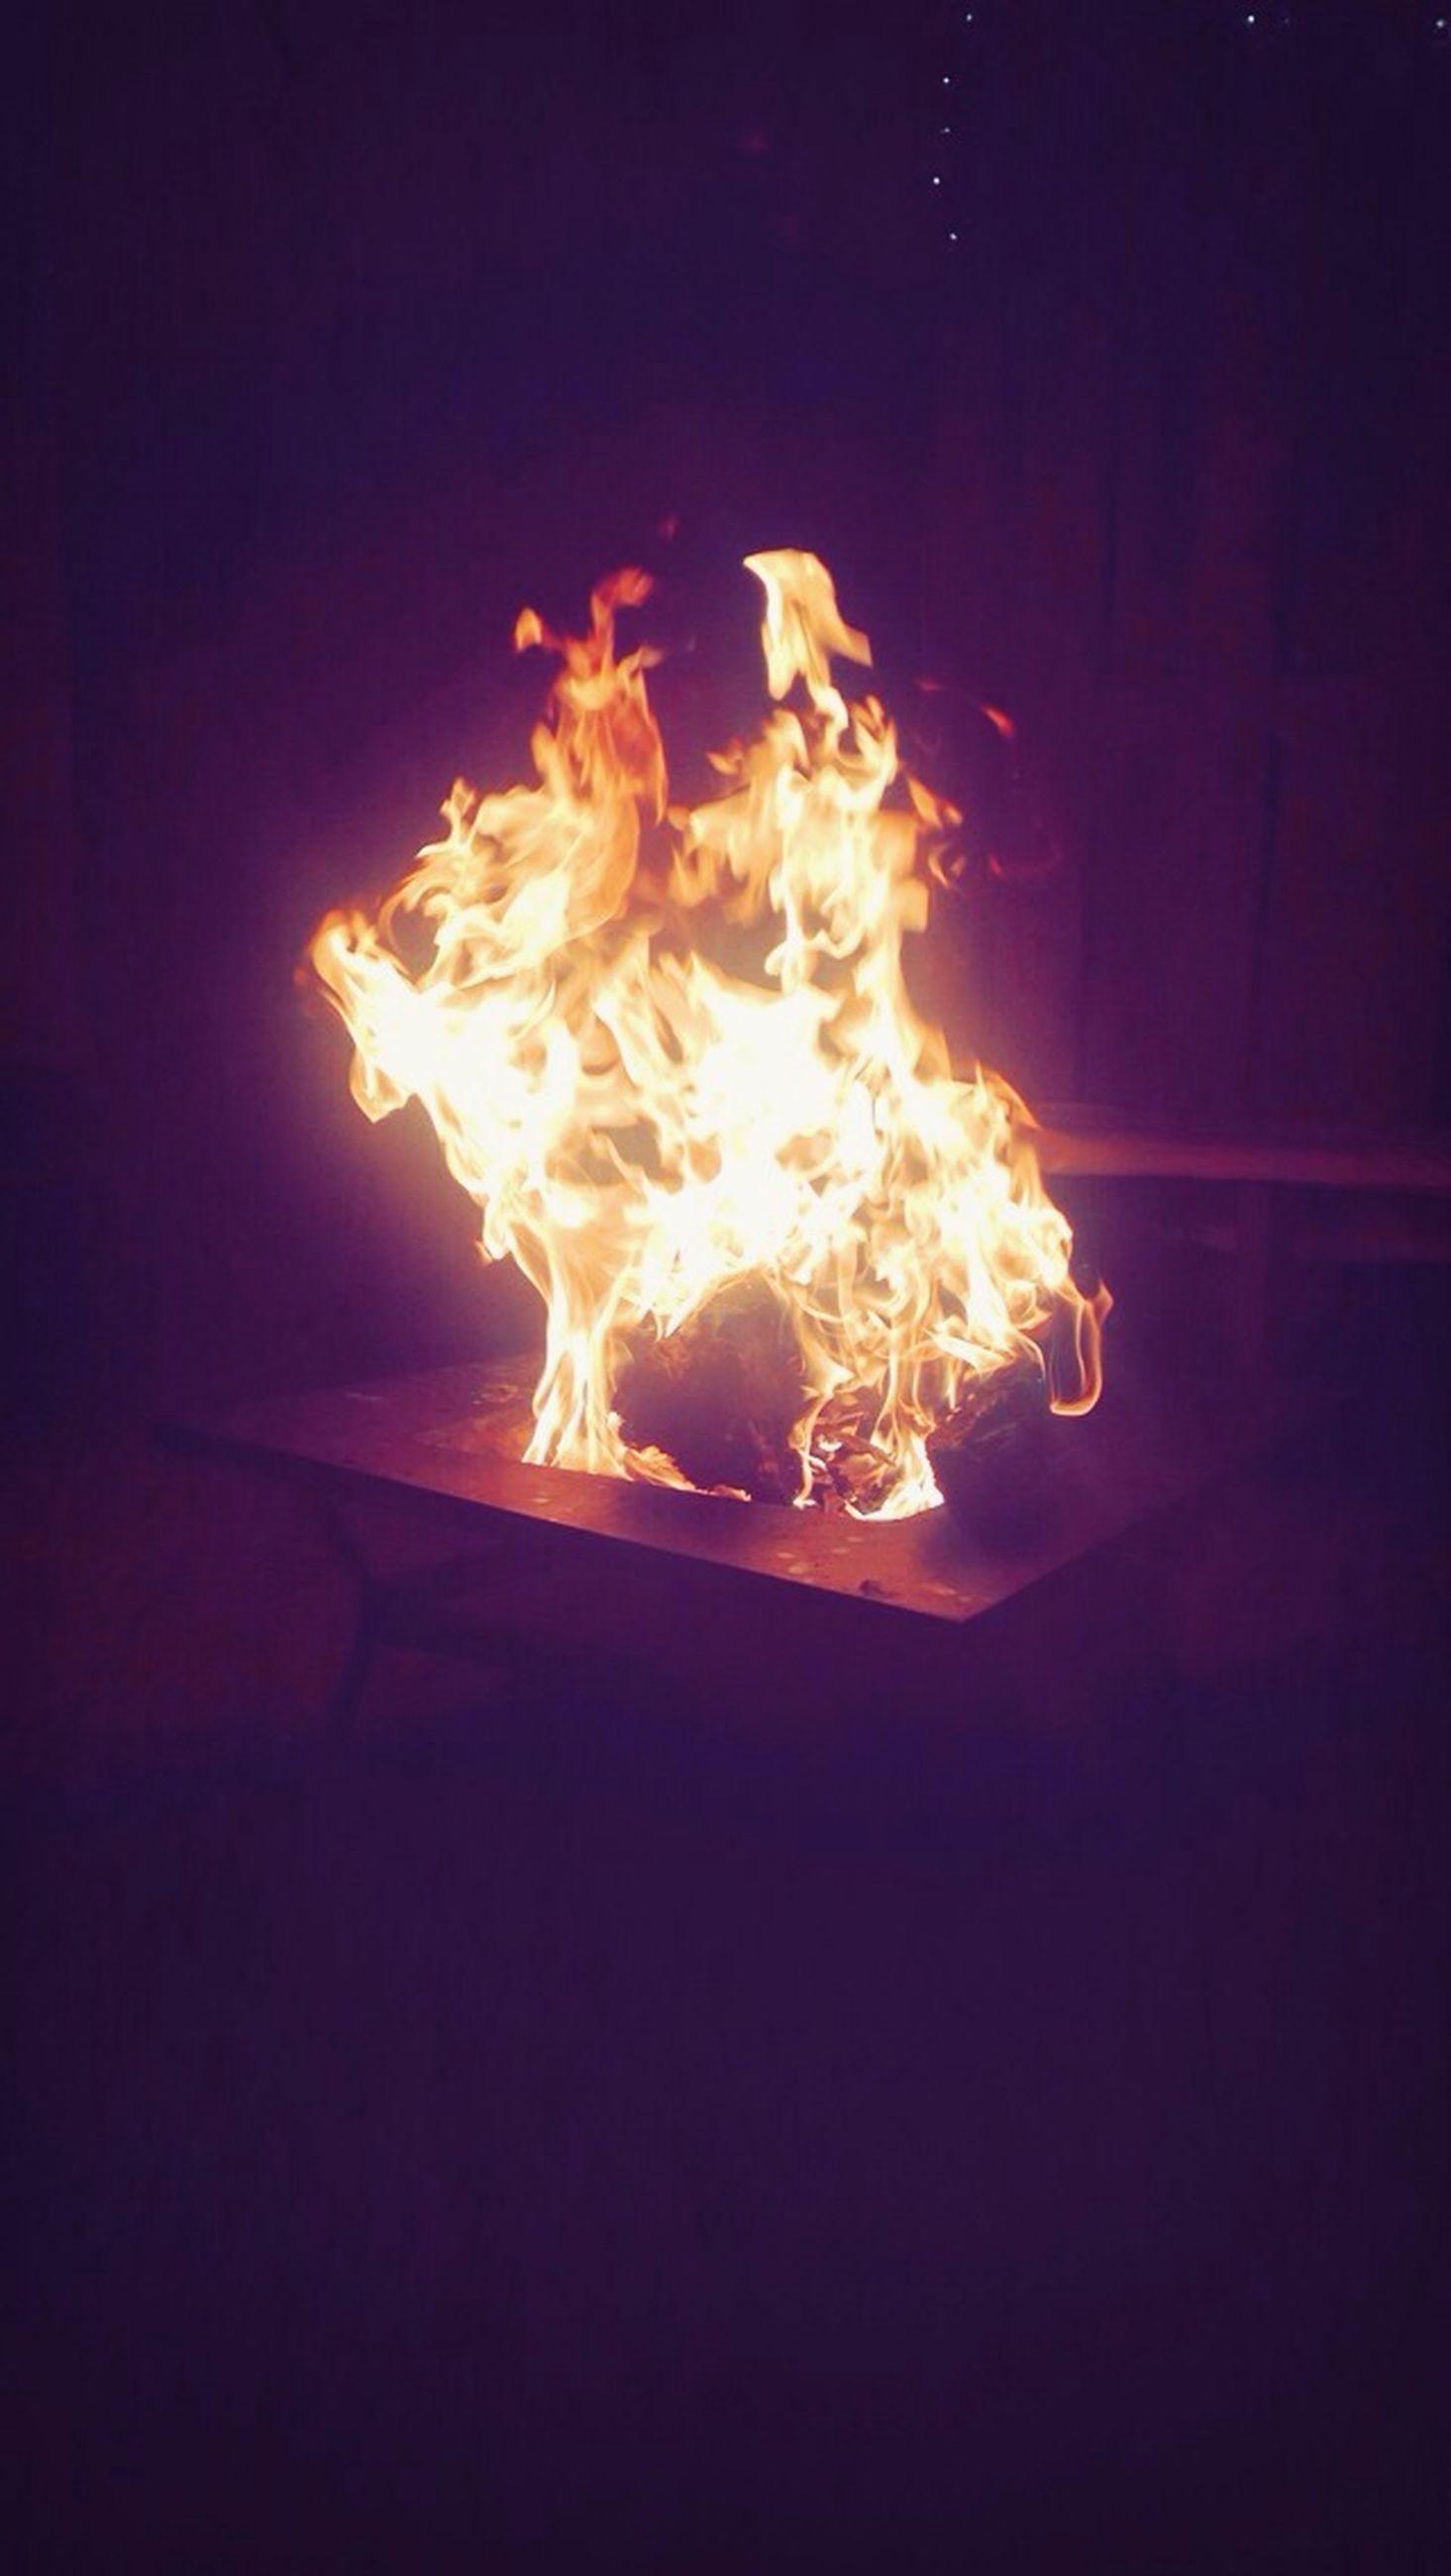 burning, flame, fire - natural phenomenon, heat - temperature, night, glowing, bonfire, fire, motion, dark, firewood, illuminated, campfire, orange color, long exposure, close-up, light - natural phenomenon, heat, no people, yellow